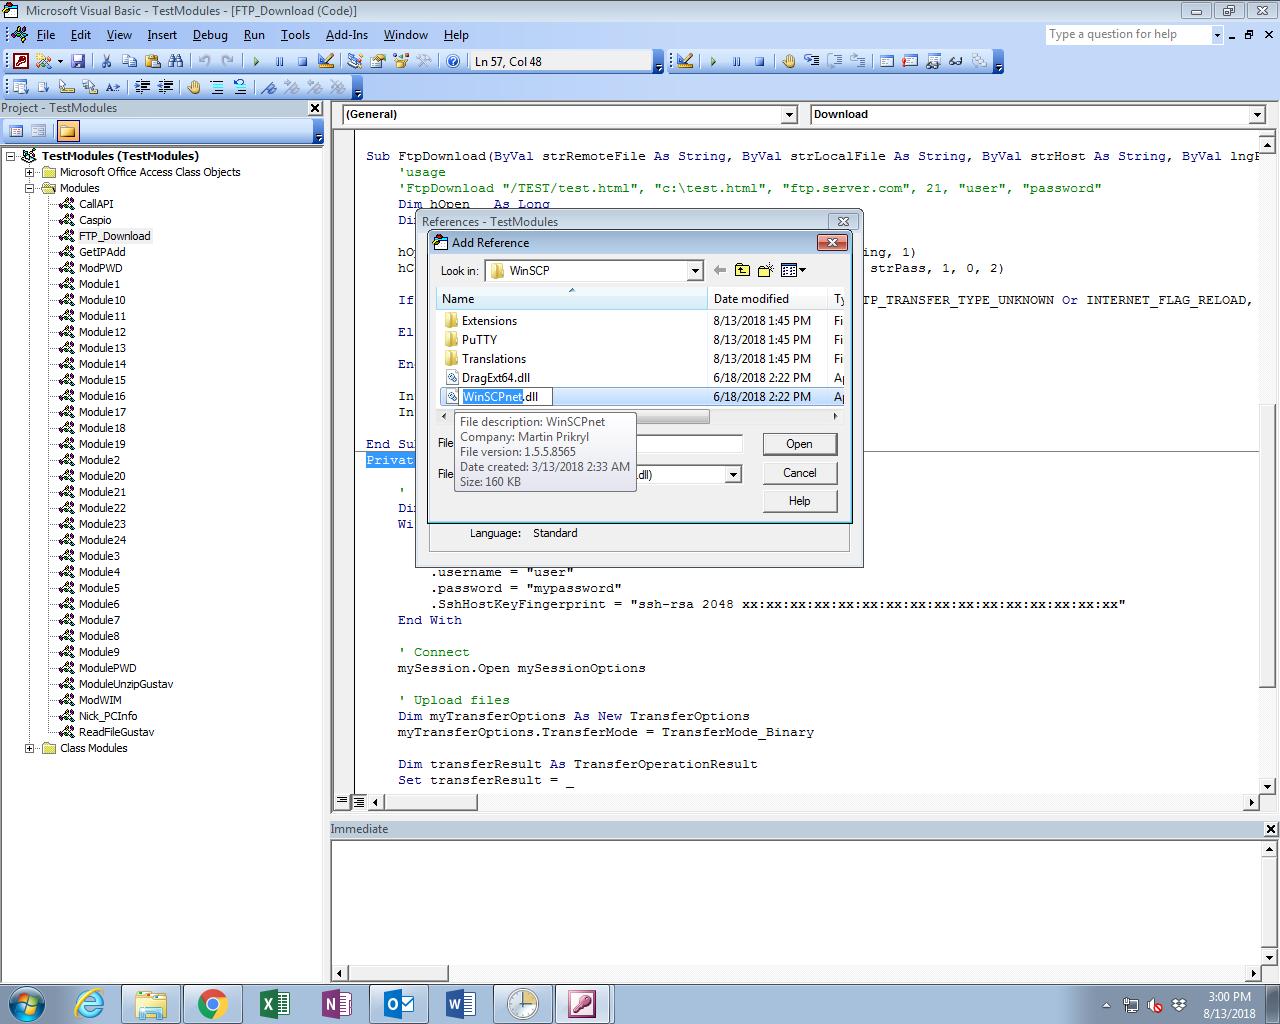 Looking to convert script into VBA code